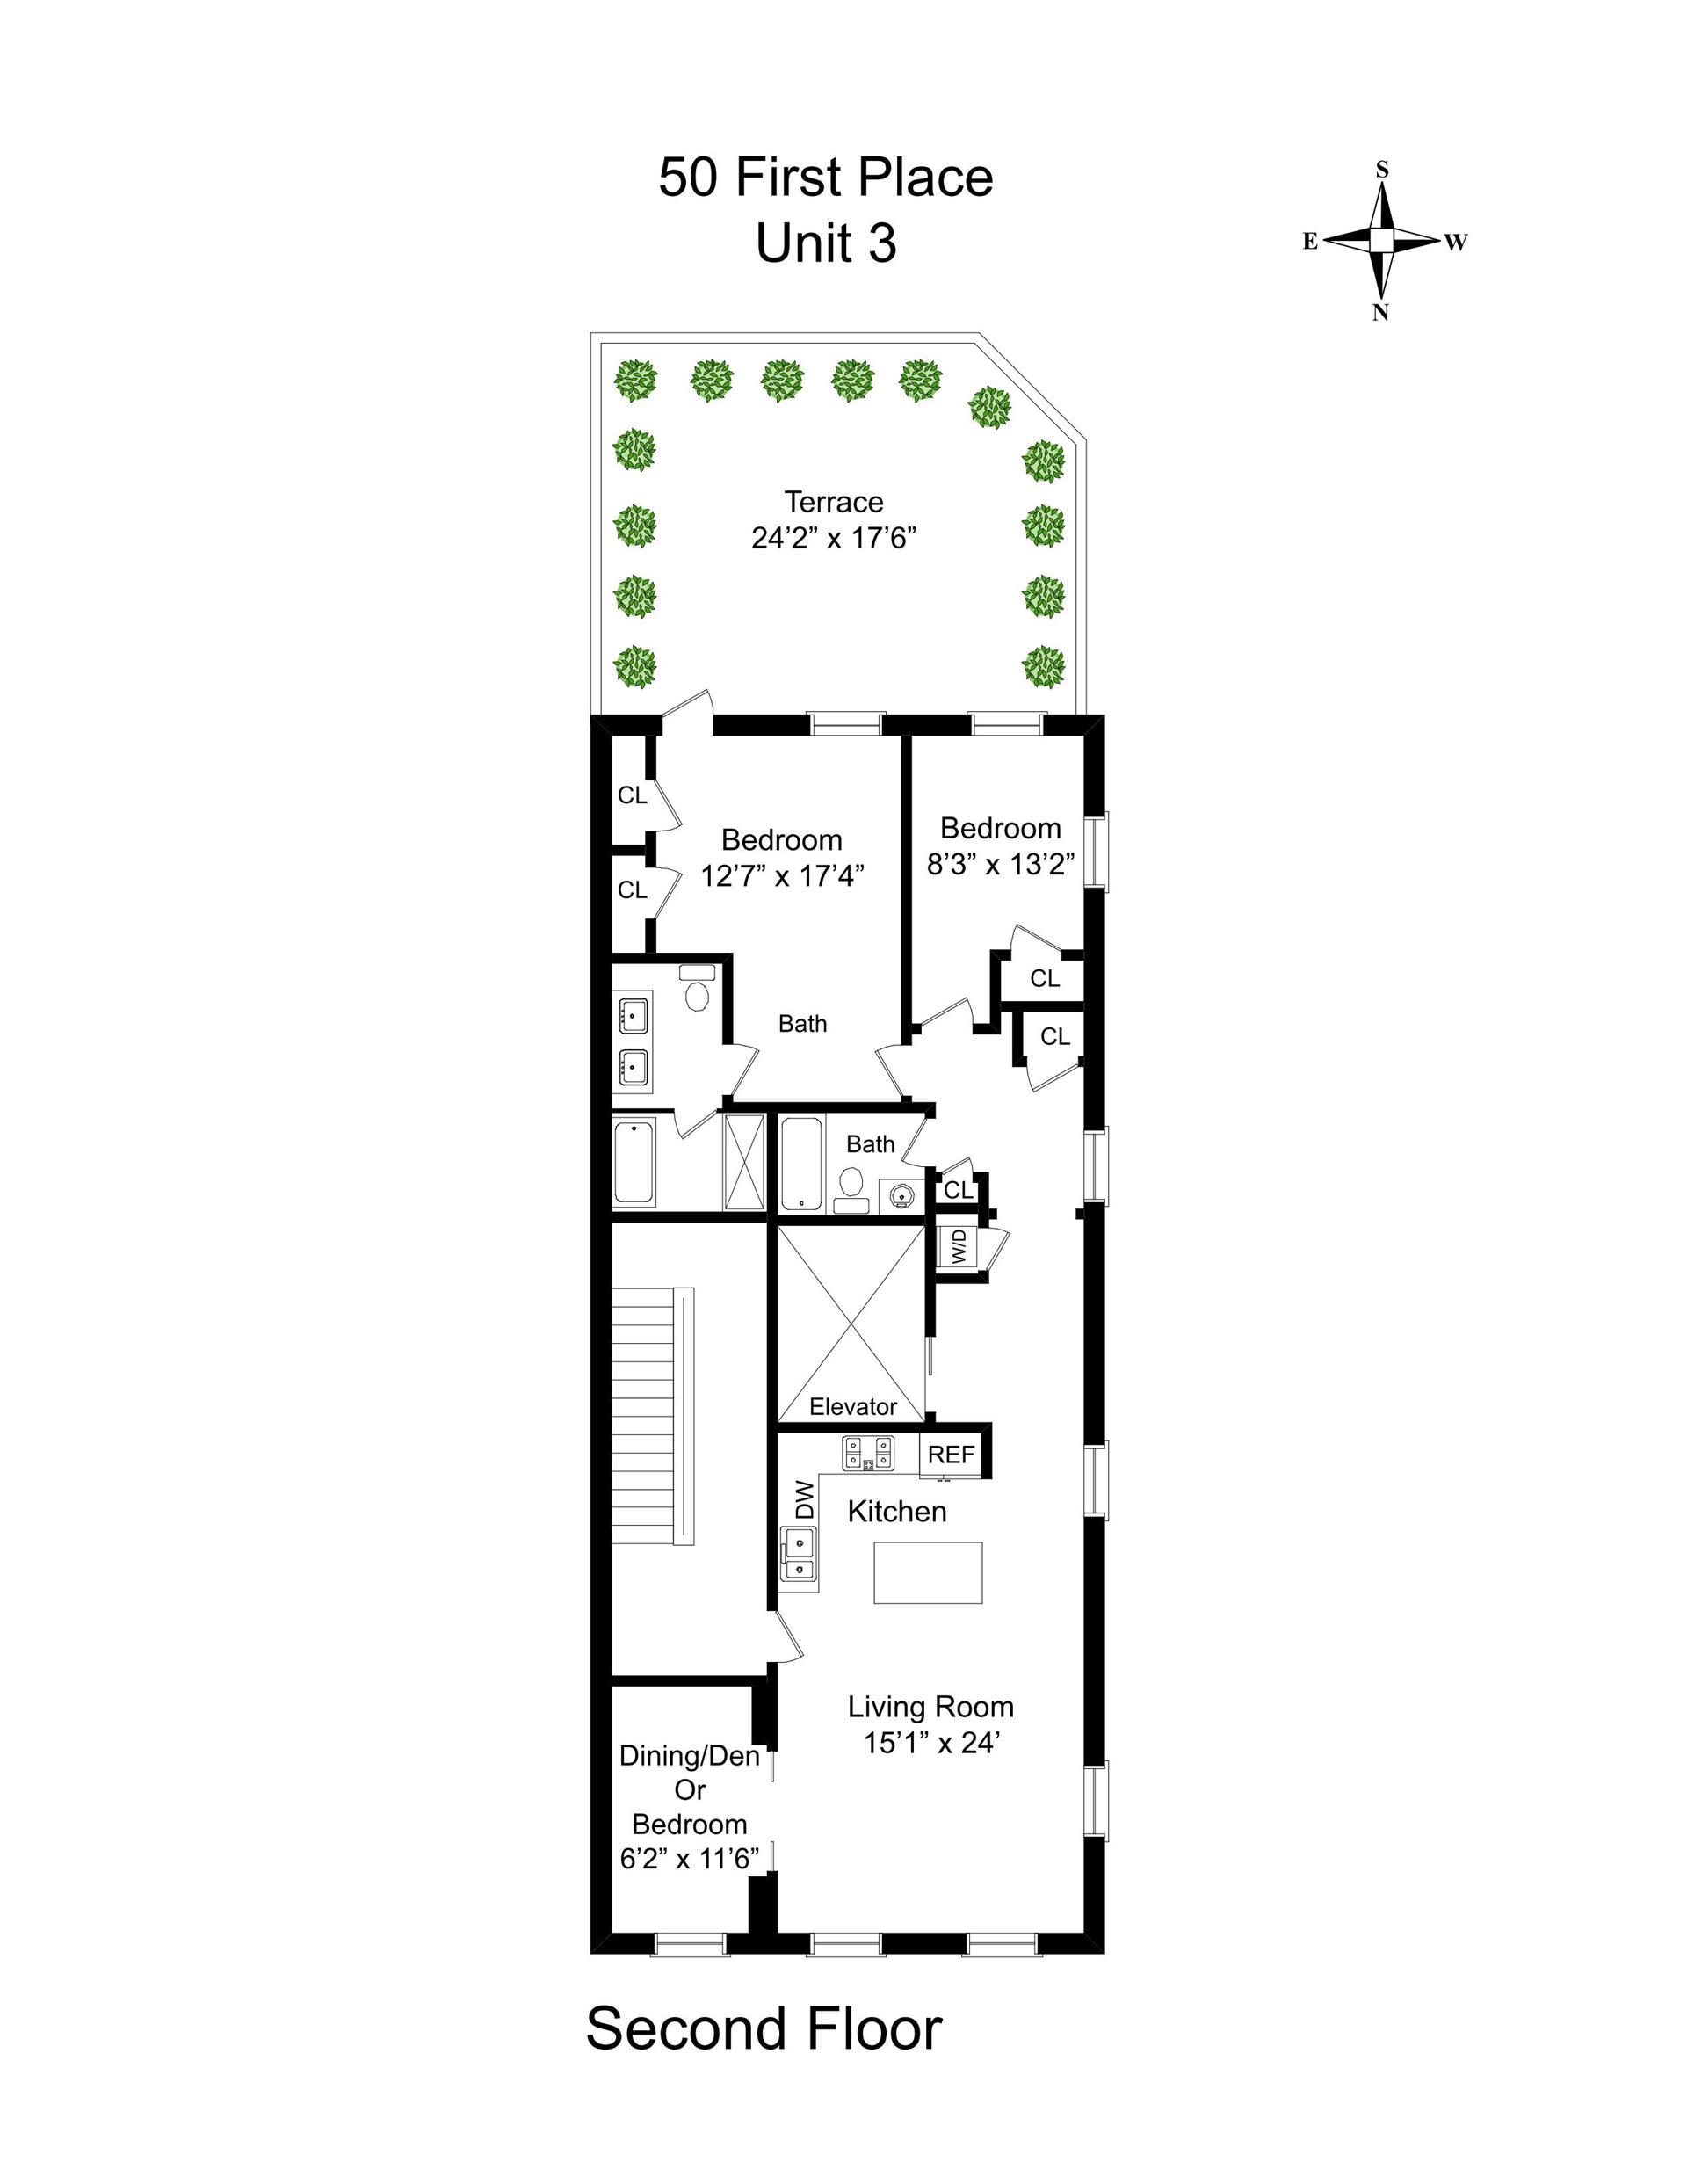 Floor plan of 50 First Pl, 3 - Carroll Gardens, New York